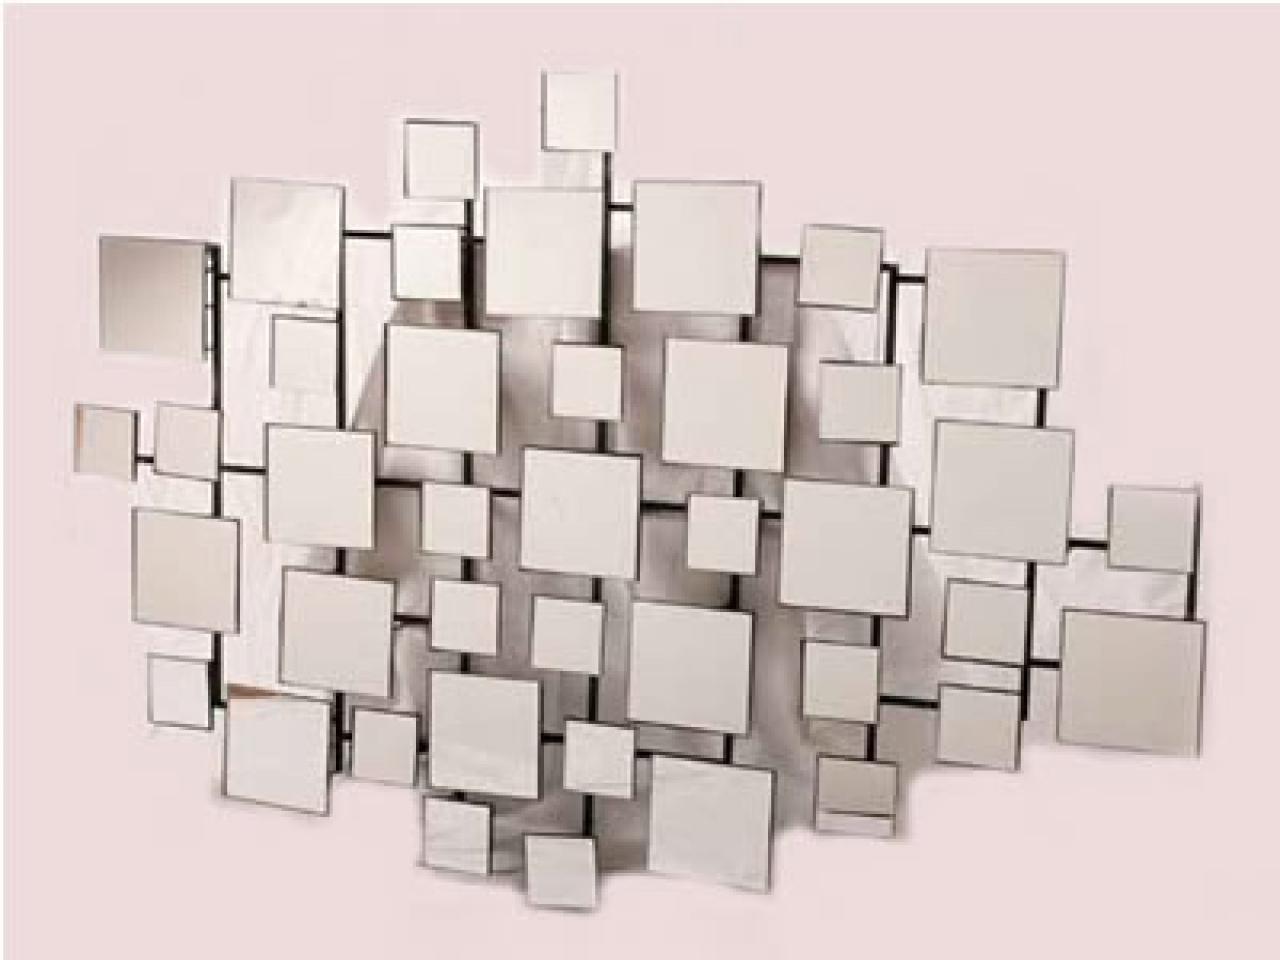 Wall Art Designs: Mirrored Wall Art Geometric Mirror Wall Art With Regard To Modern Mirrored Wall Art (Image 18 of 20)